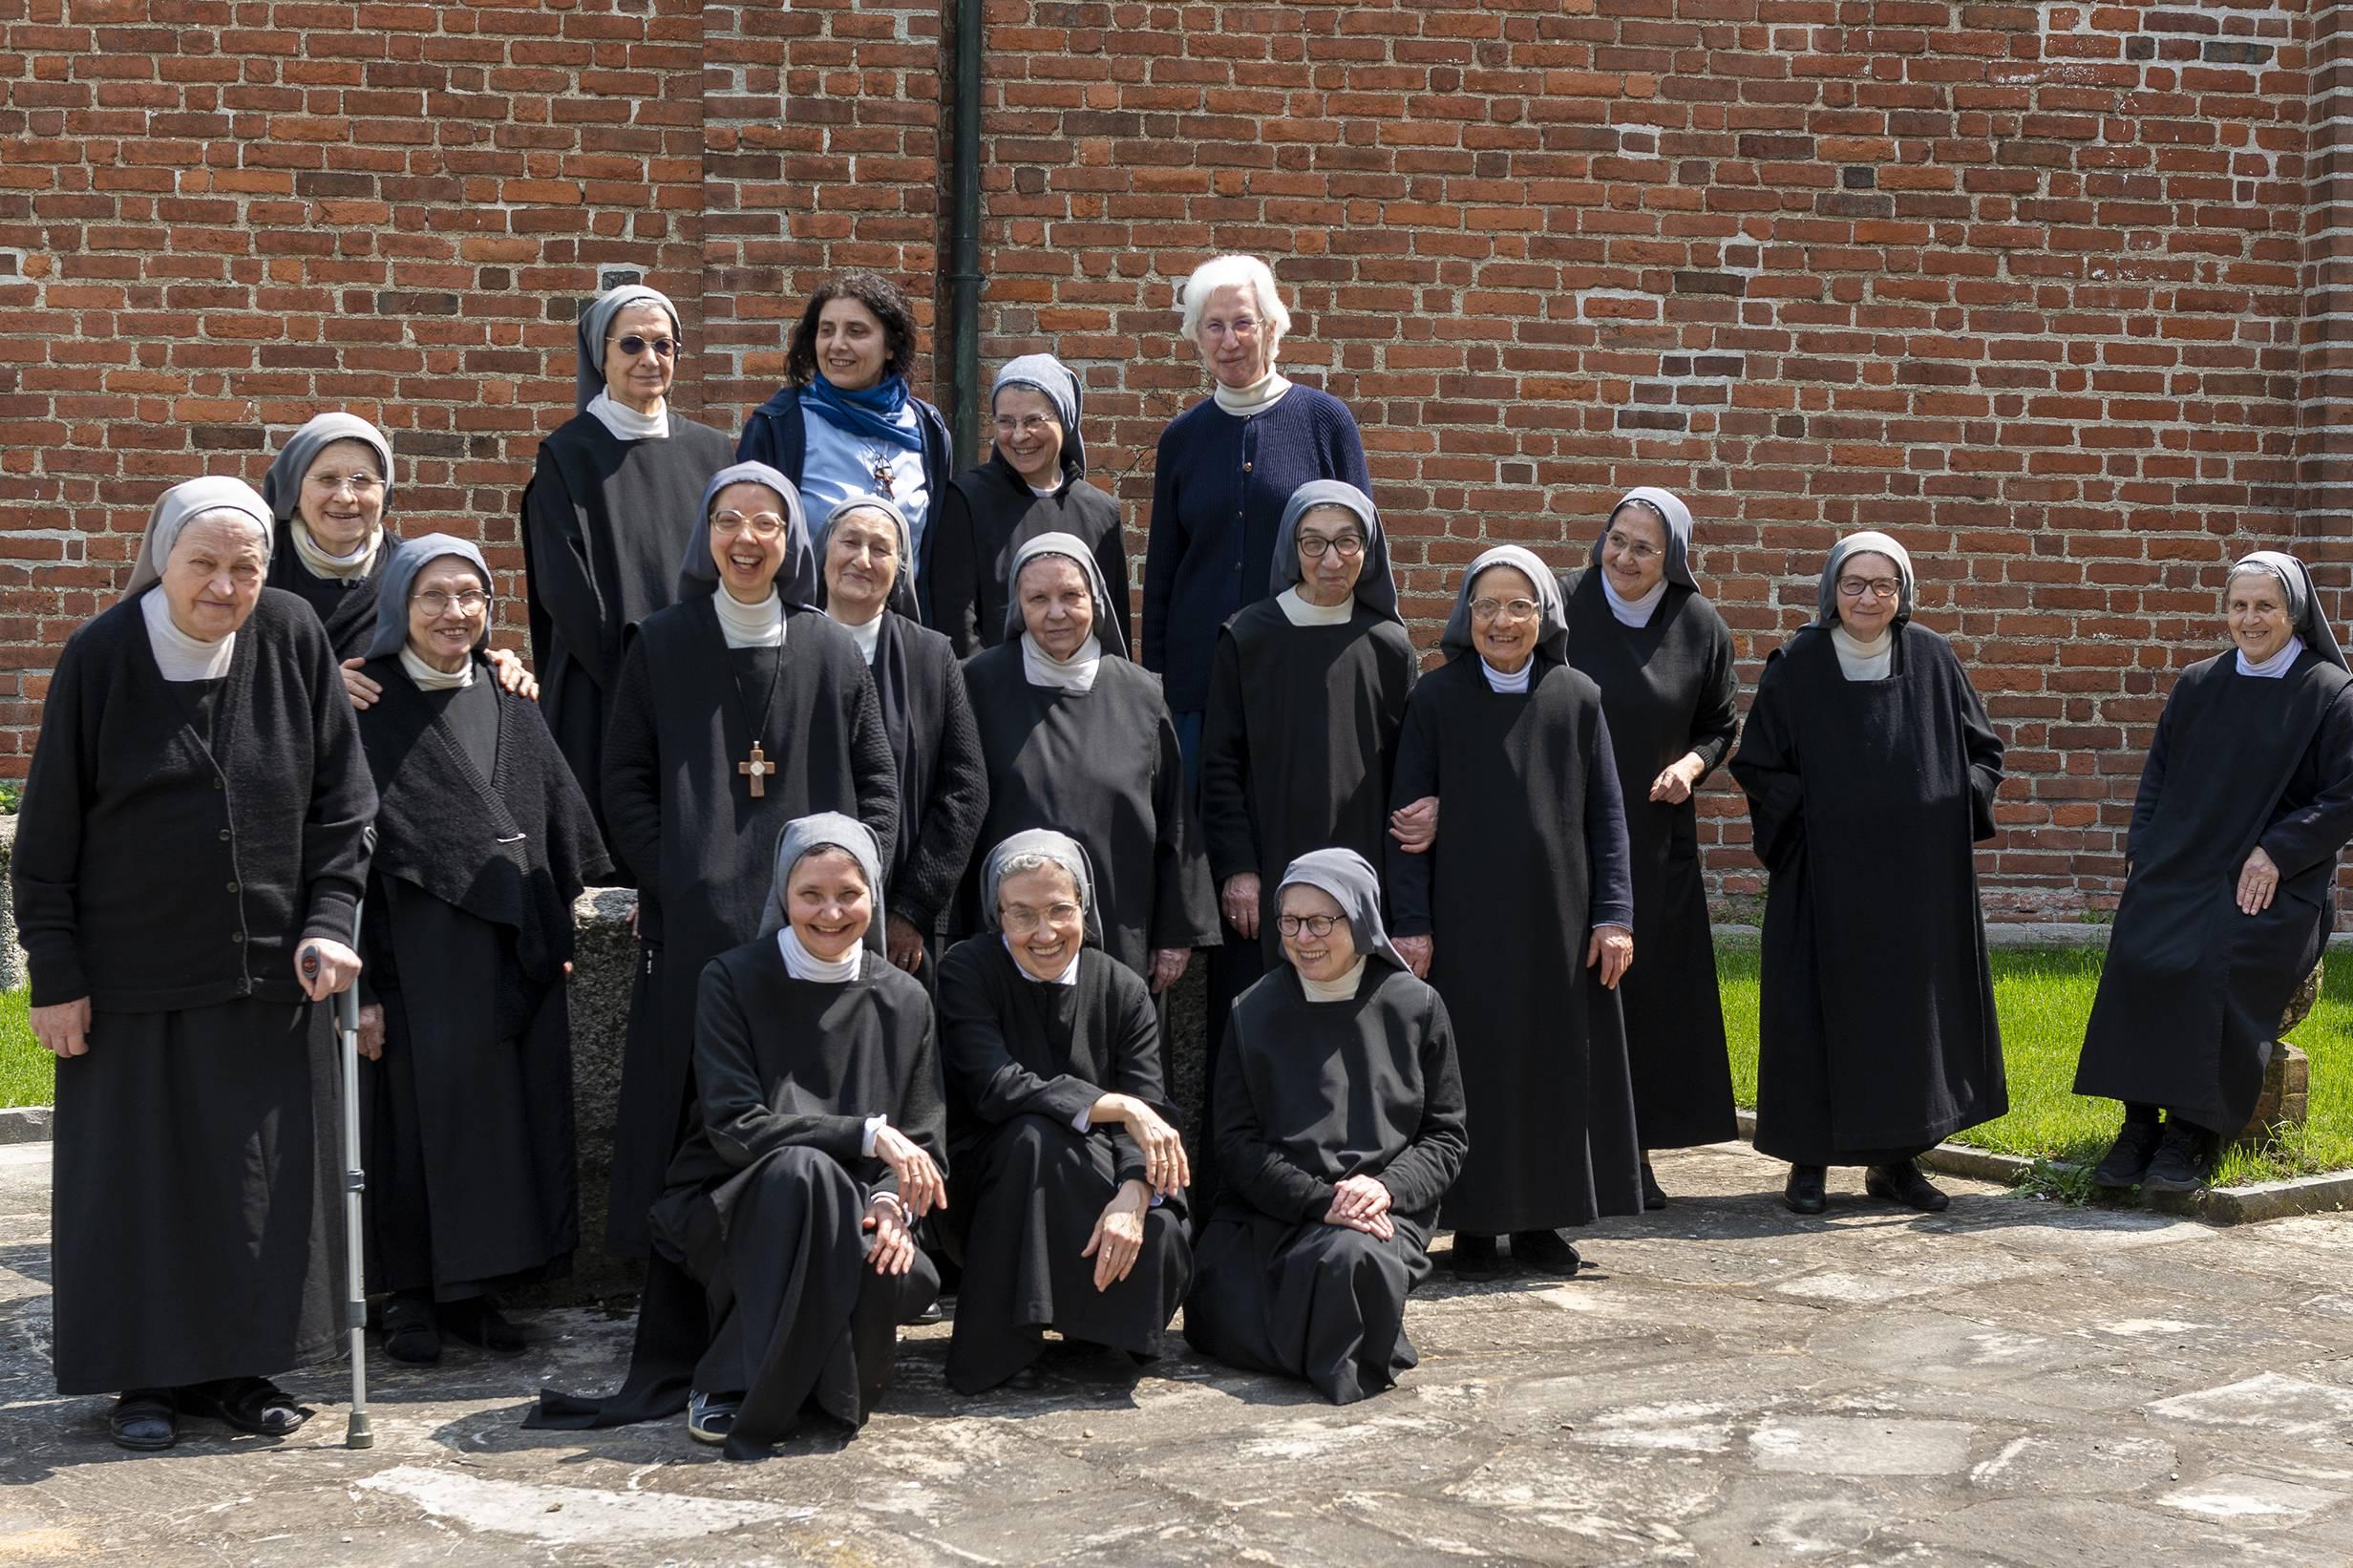 Carmelitane di Legnano